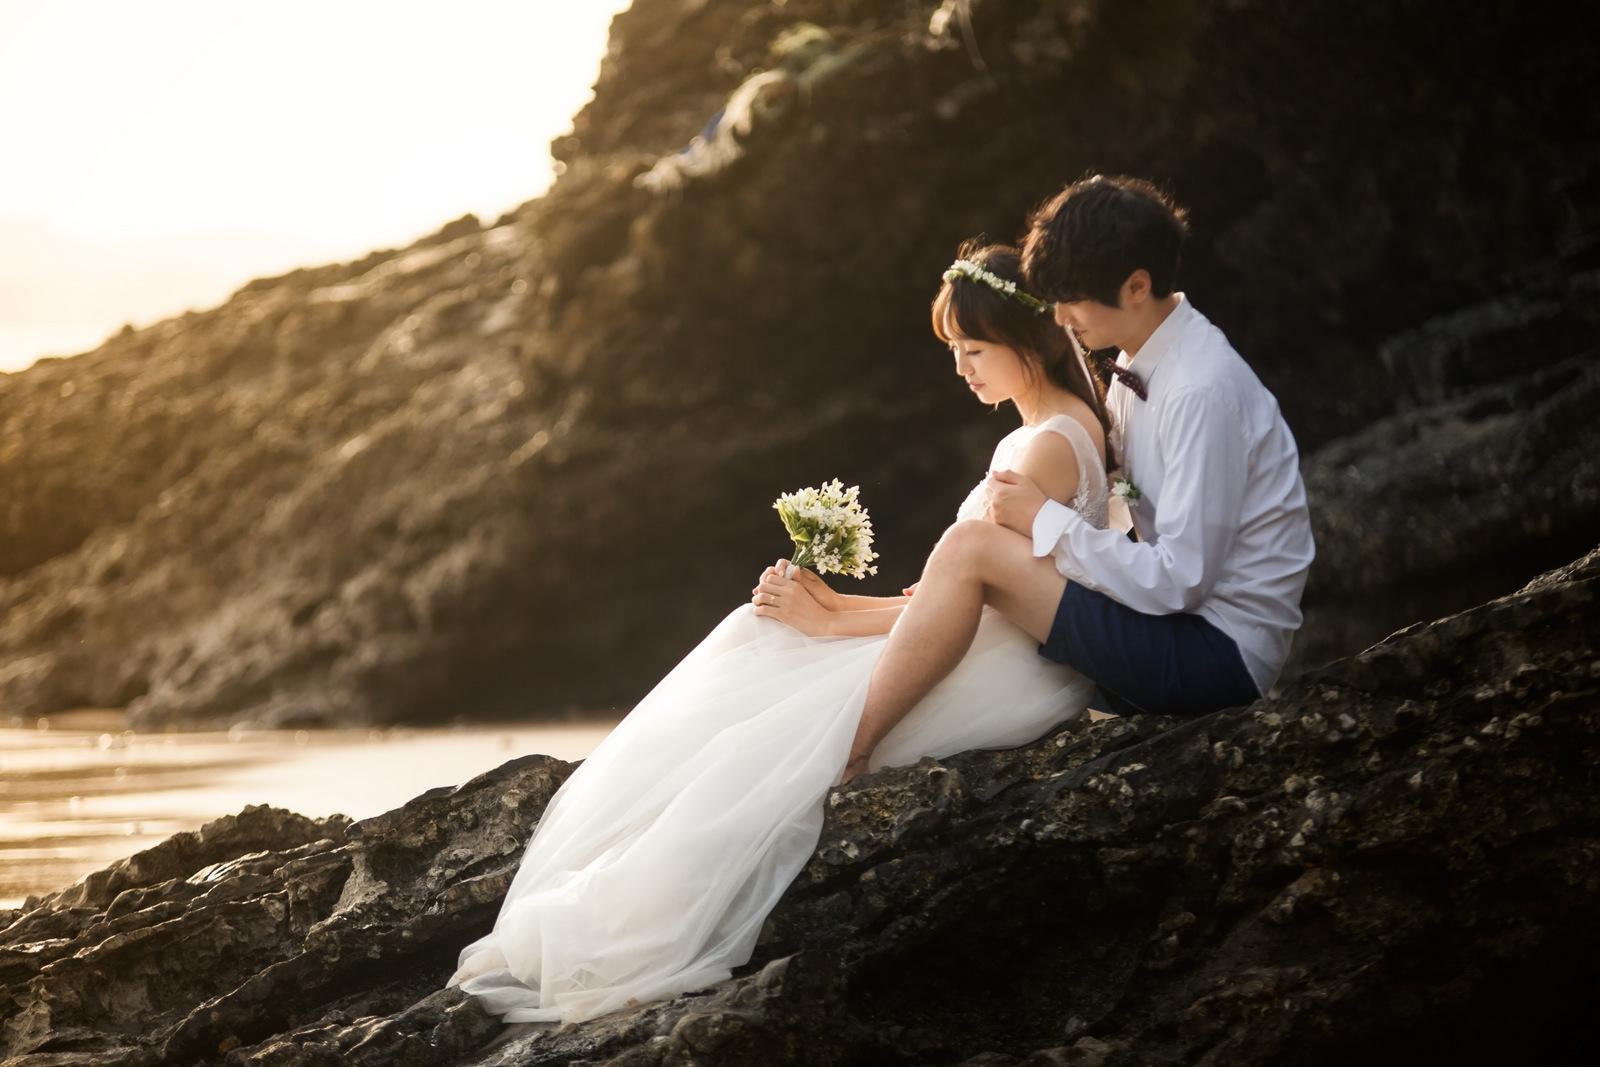 Thailand Wedding Photography: Krabi Post Wedding Photography